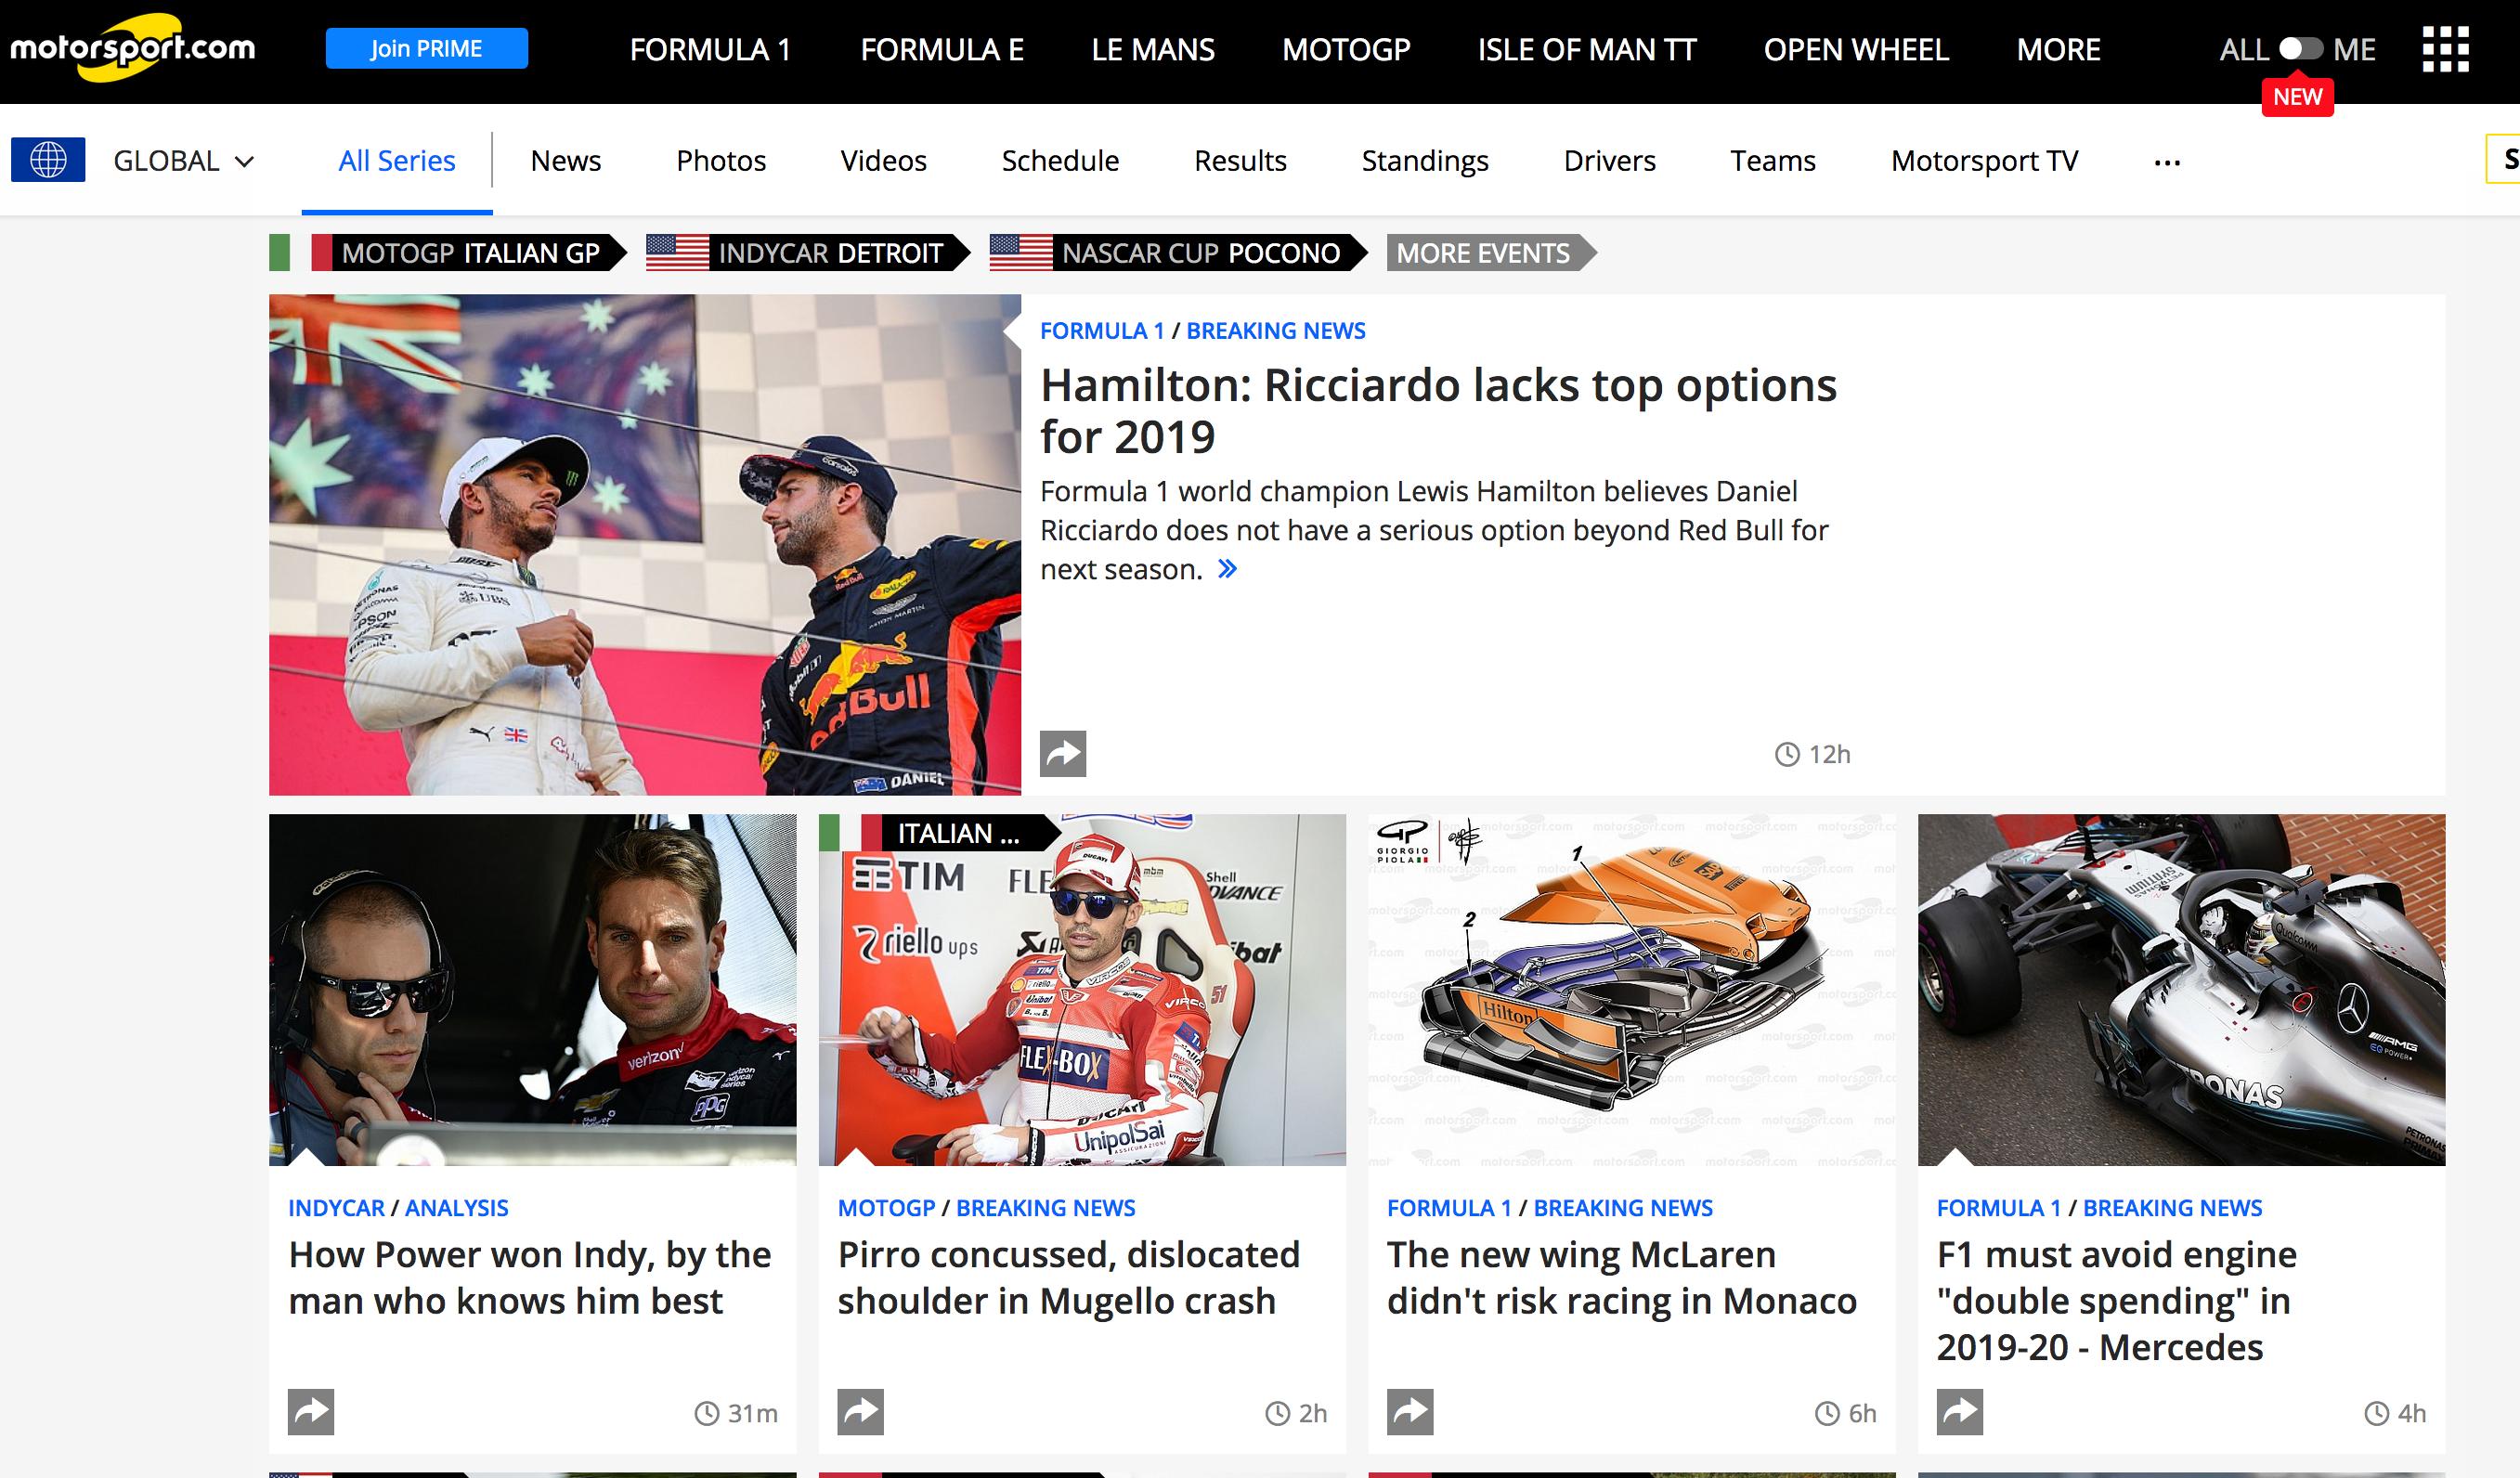 Motorsport.com screenshot